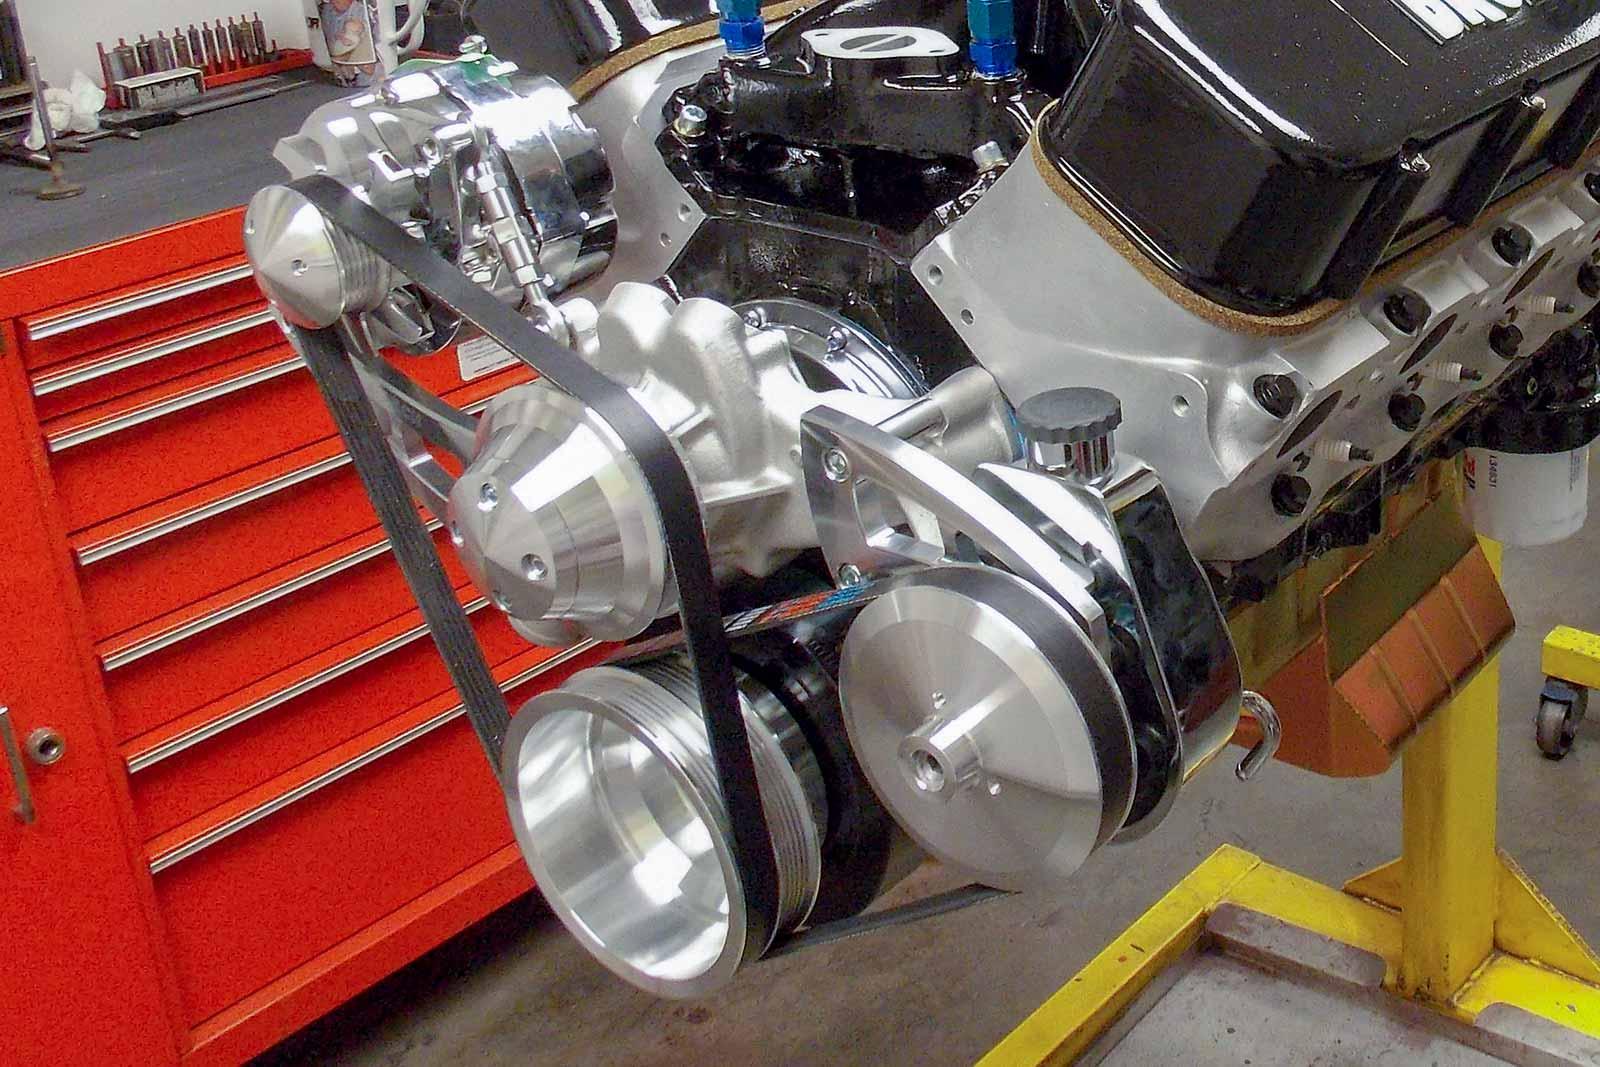 Details about 489 Big Block Chevy Stroker Crate Engine 454 - 550HP Camaro  Chevelle Nova Vette